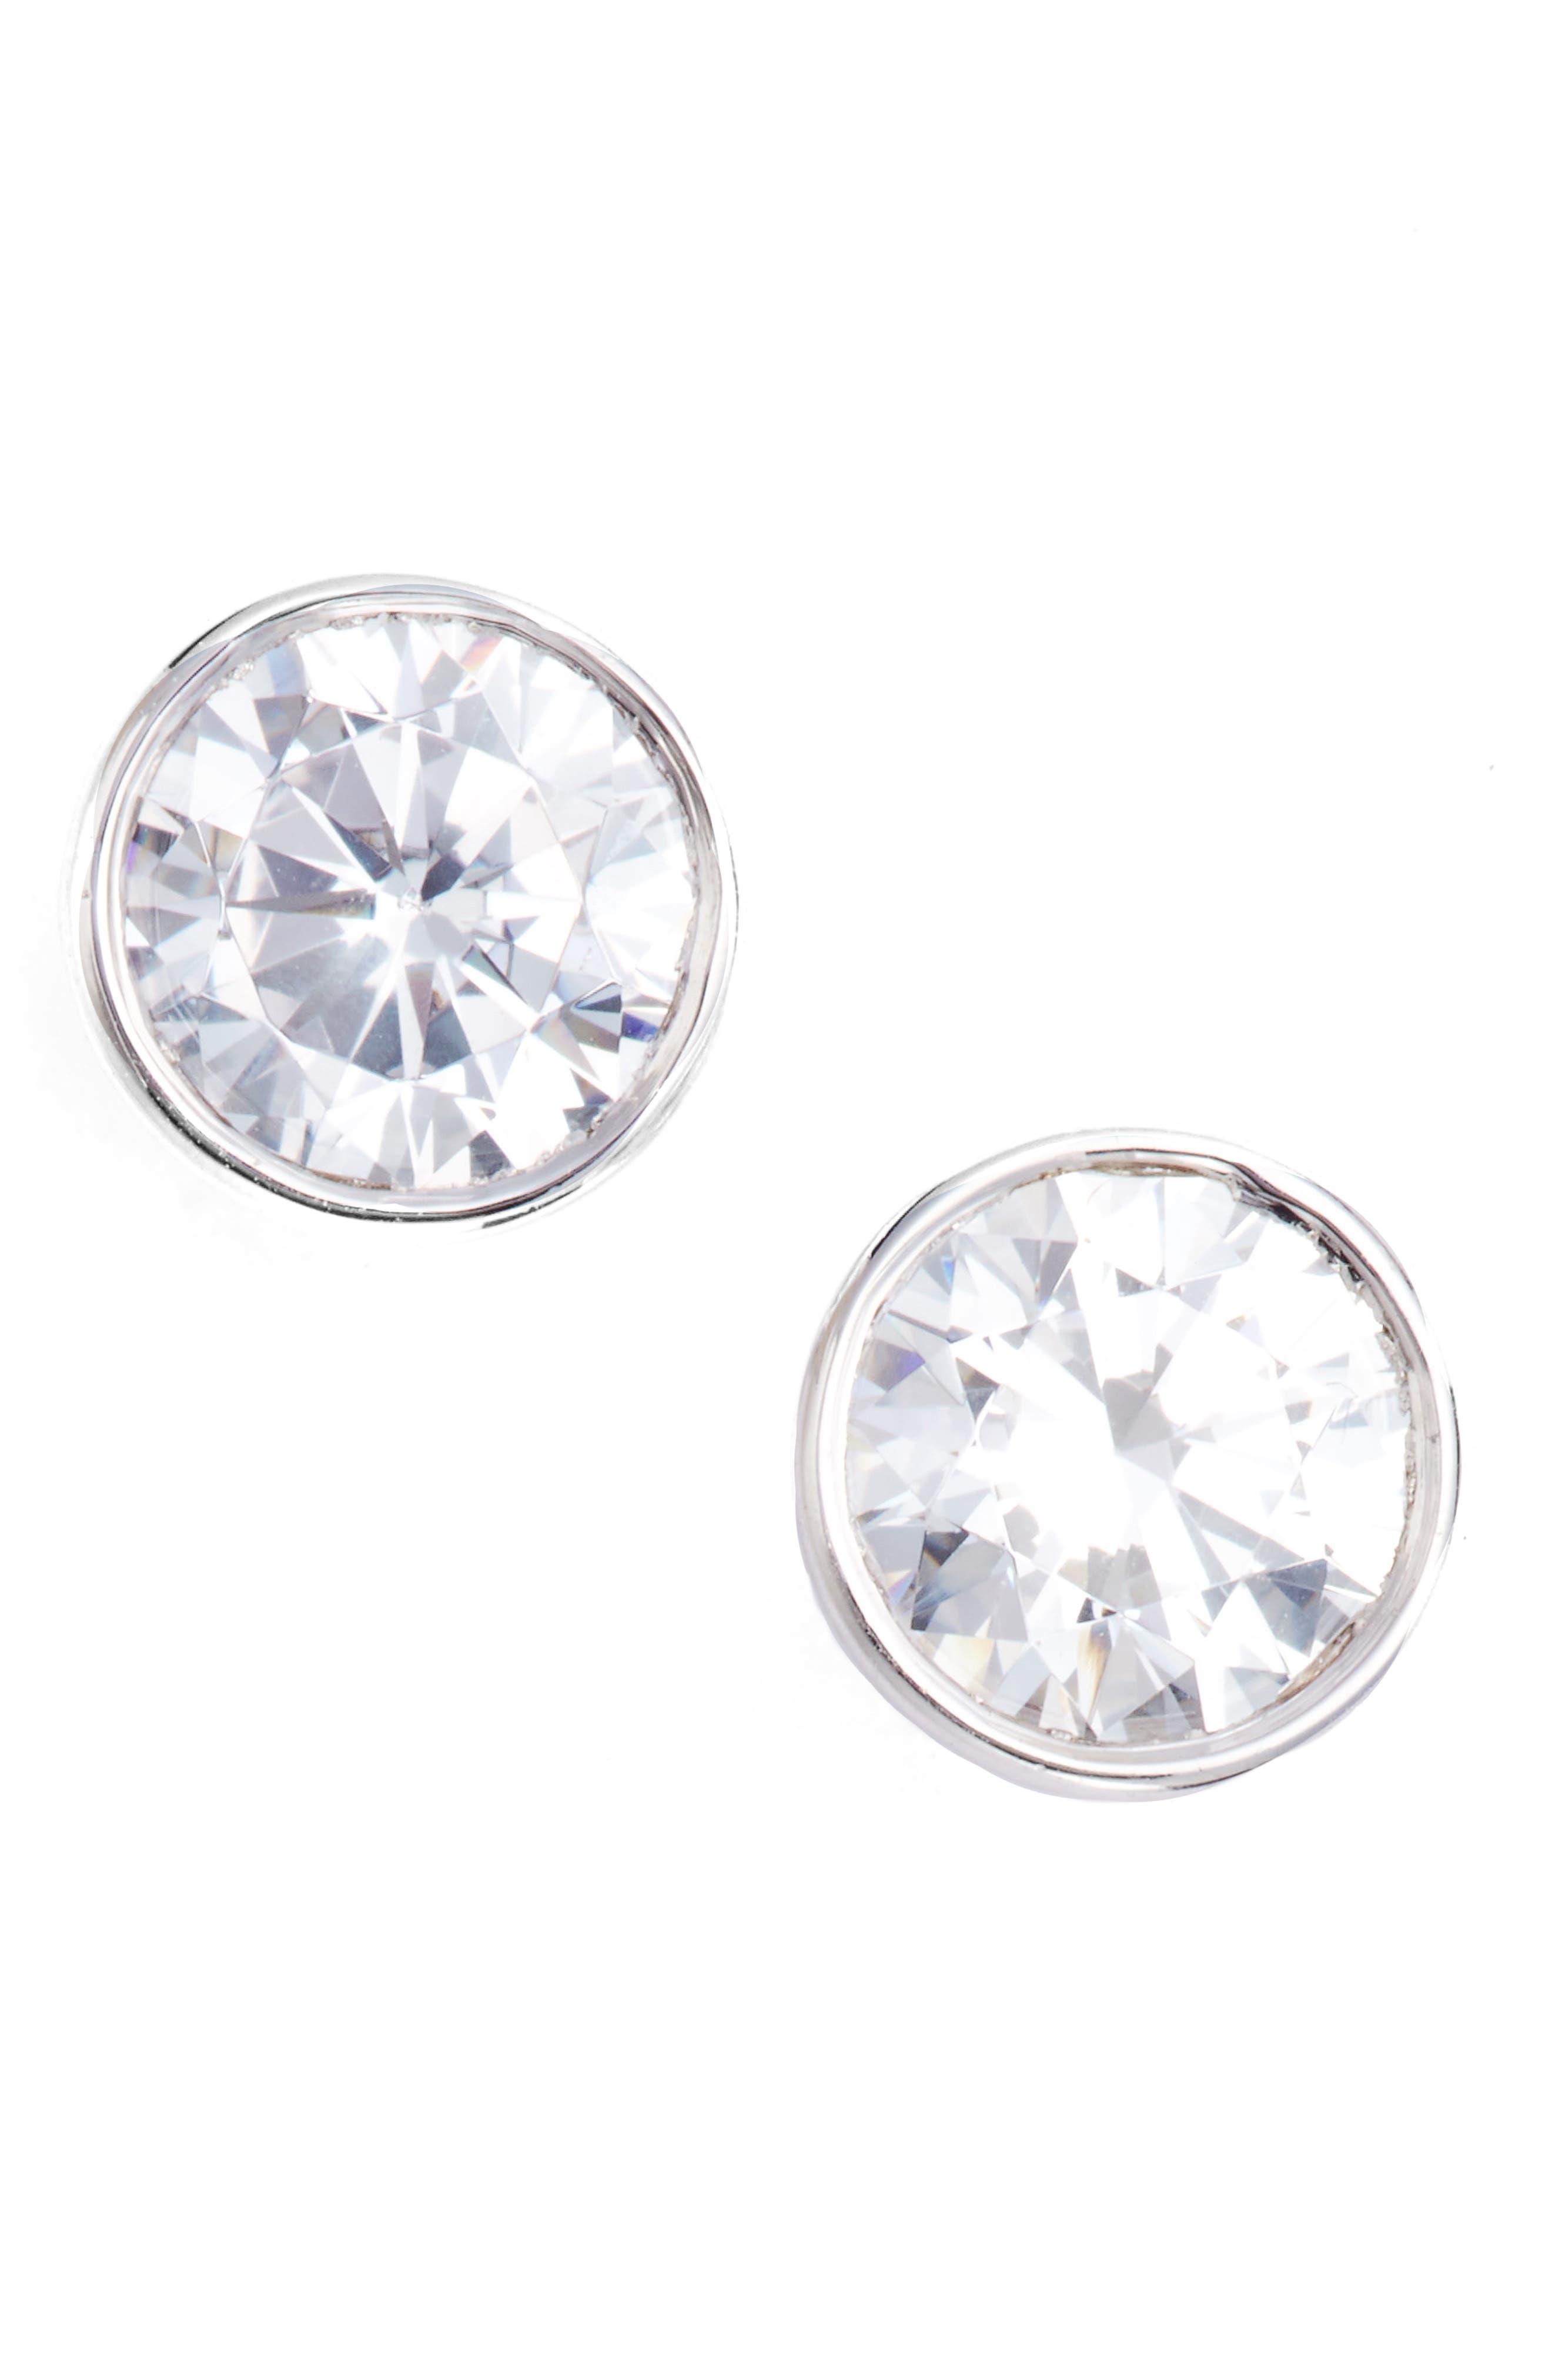 Cubic Zirconia Bezel Stud Earrings,                         Main,                         color, Platinum